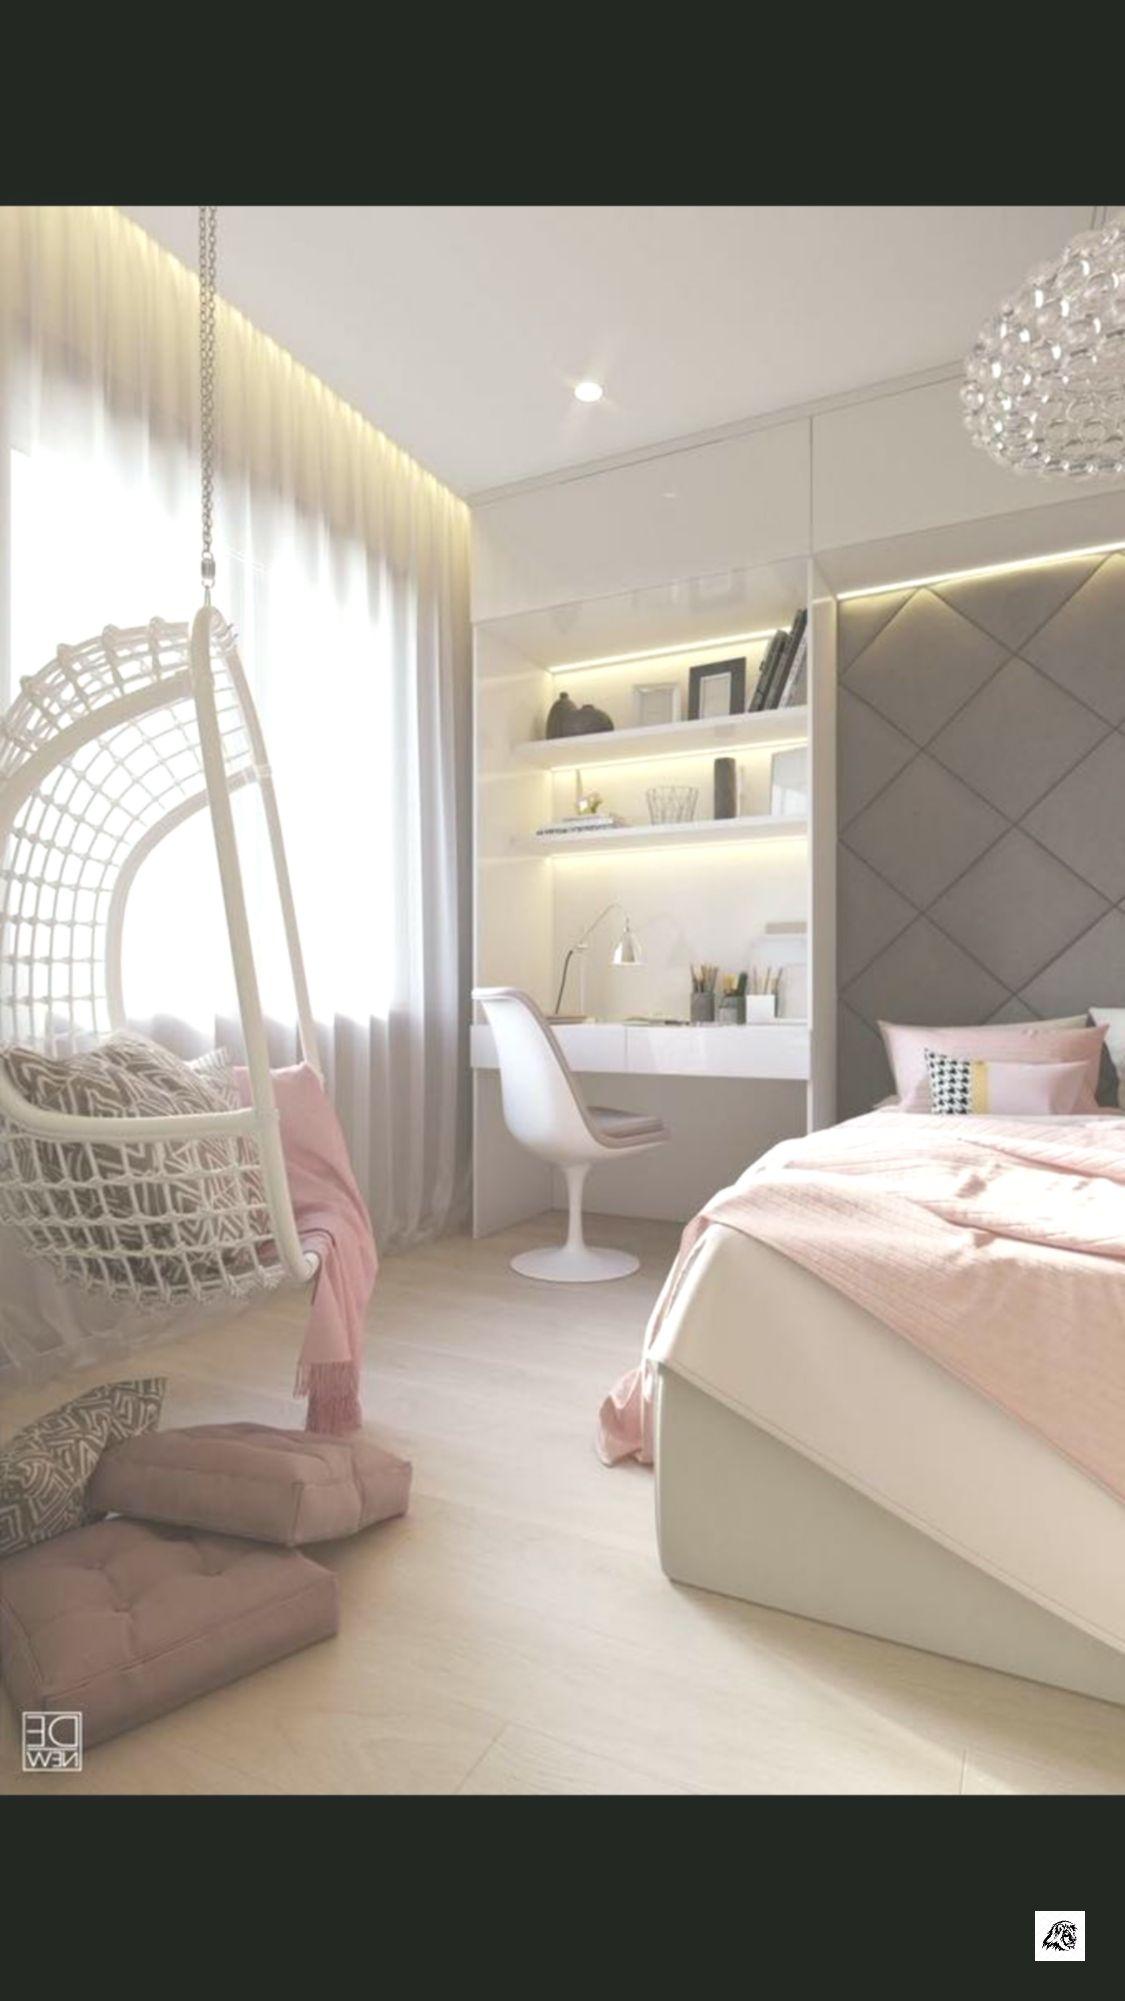 . 31  new bedroom ideas   Amazing Bedroom Ideas 2019   bedroom modella